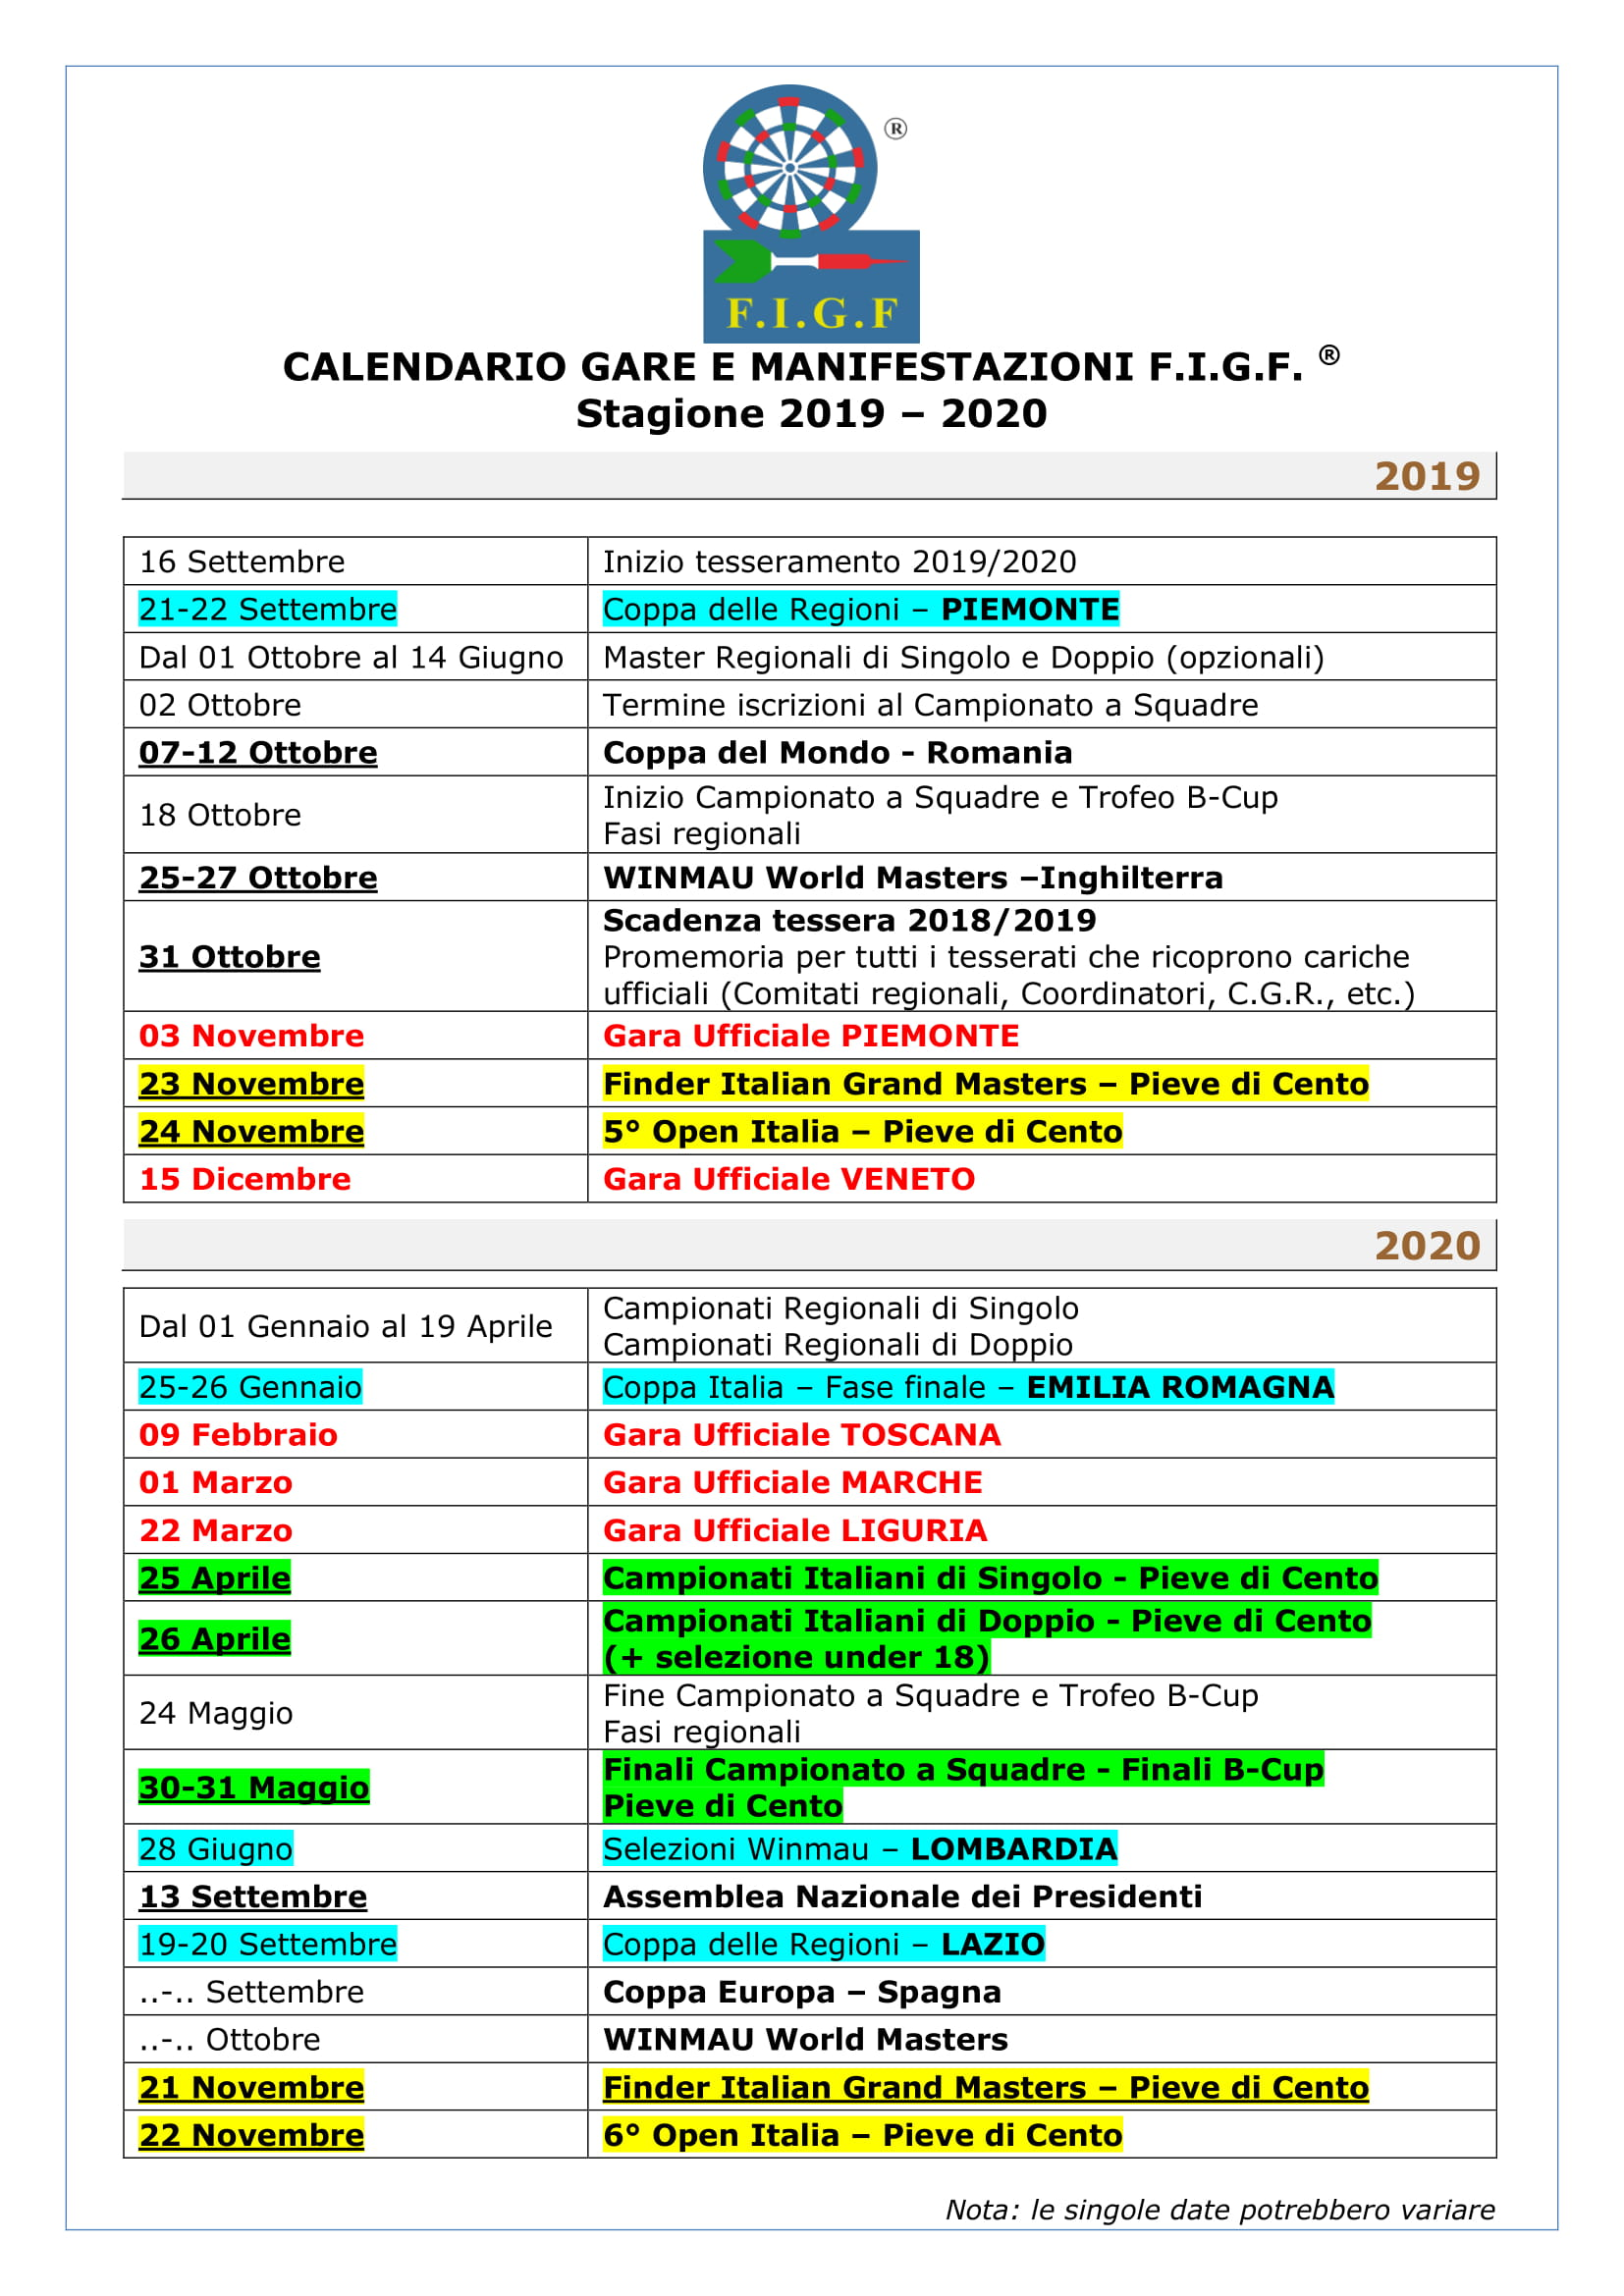 Novembre 2020 Calendario.Calendario 2019 2020 Figf Italia It